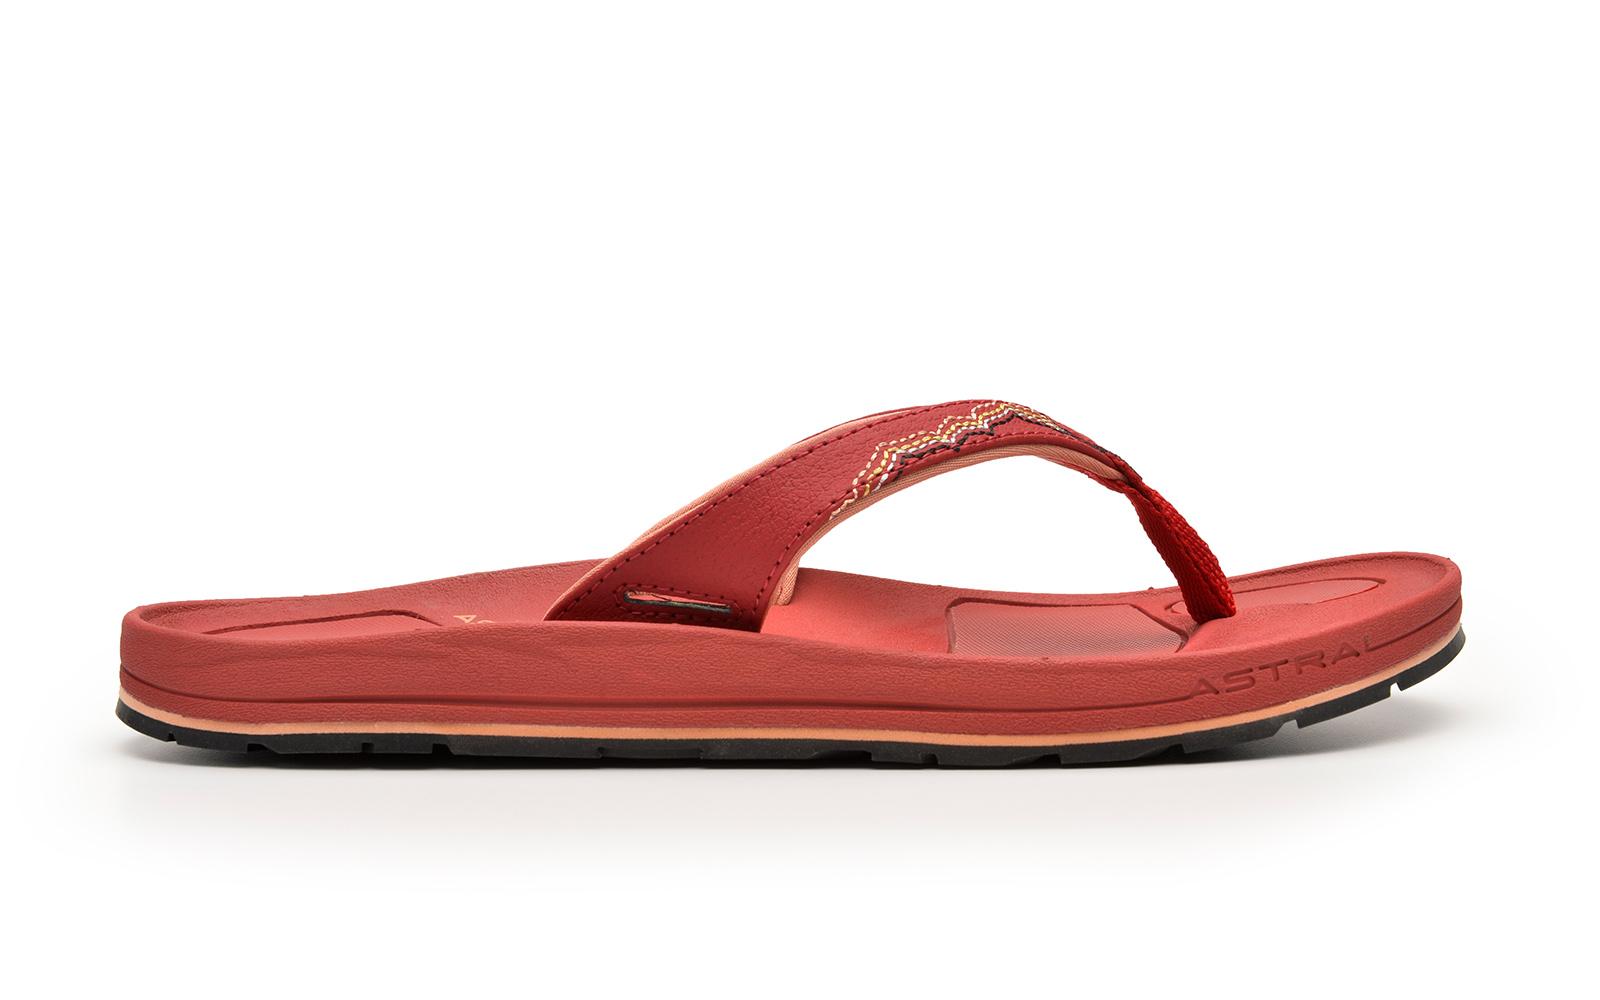 c8fbdb72e32b Rosa Women s Water Sandals